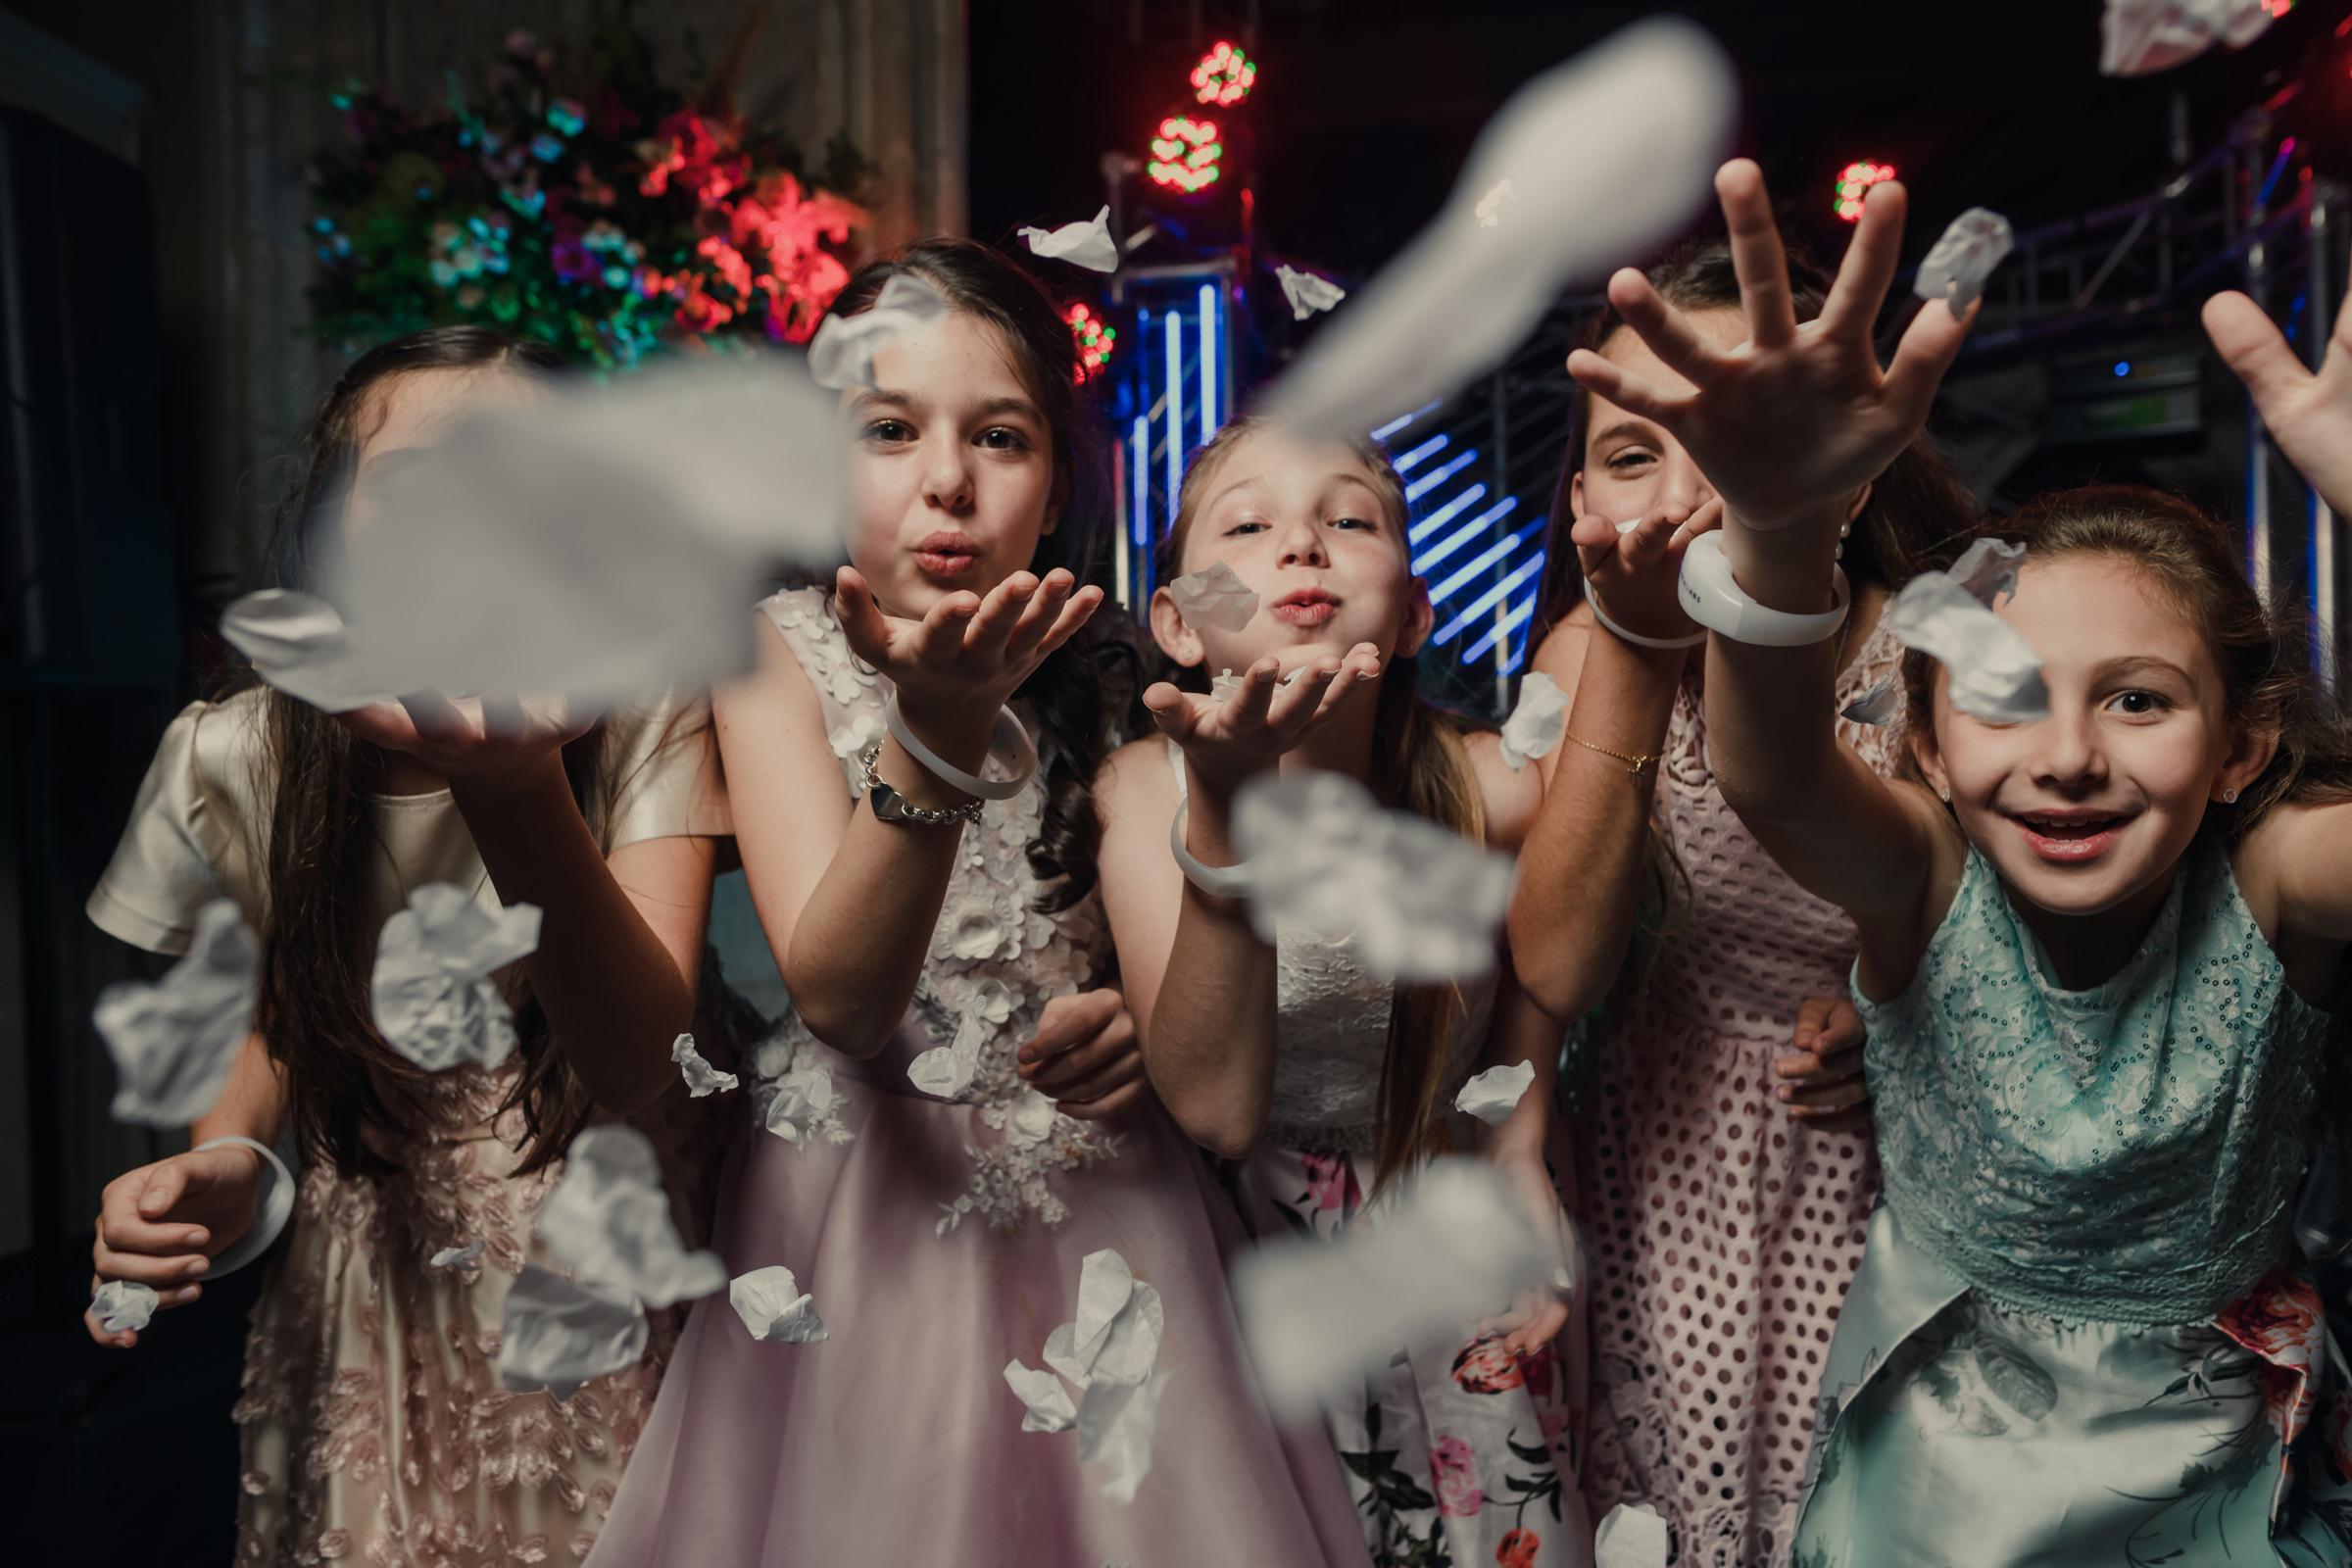 Flower girls blowing petals at camera, by Victor Marti, El Marco Rojo Photography